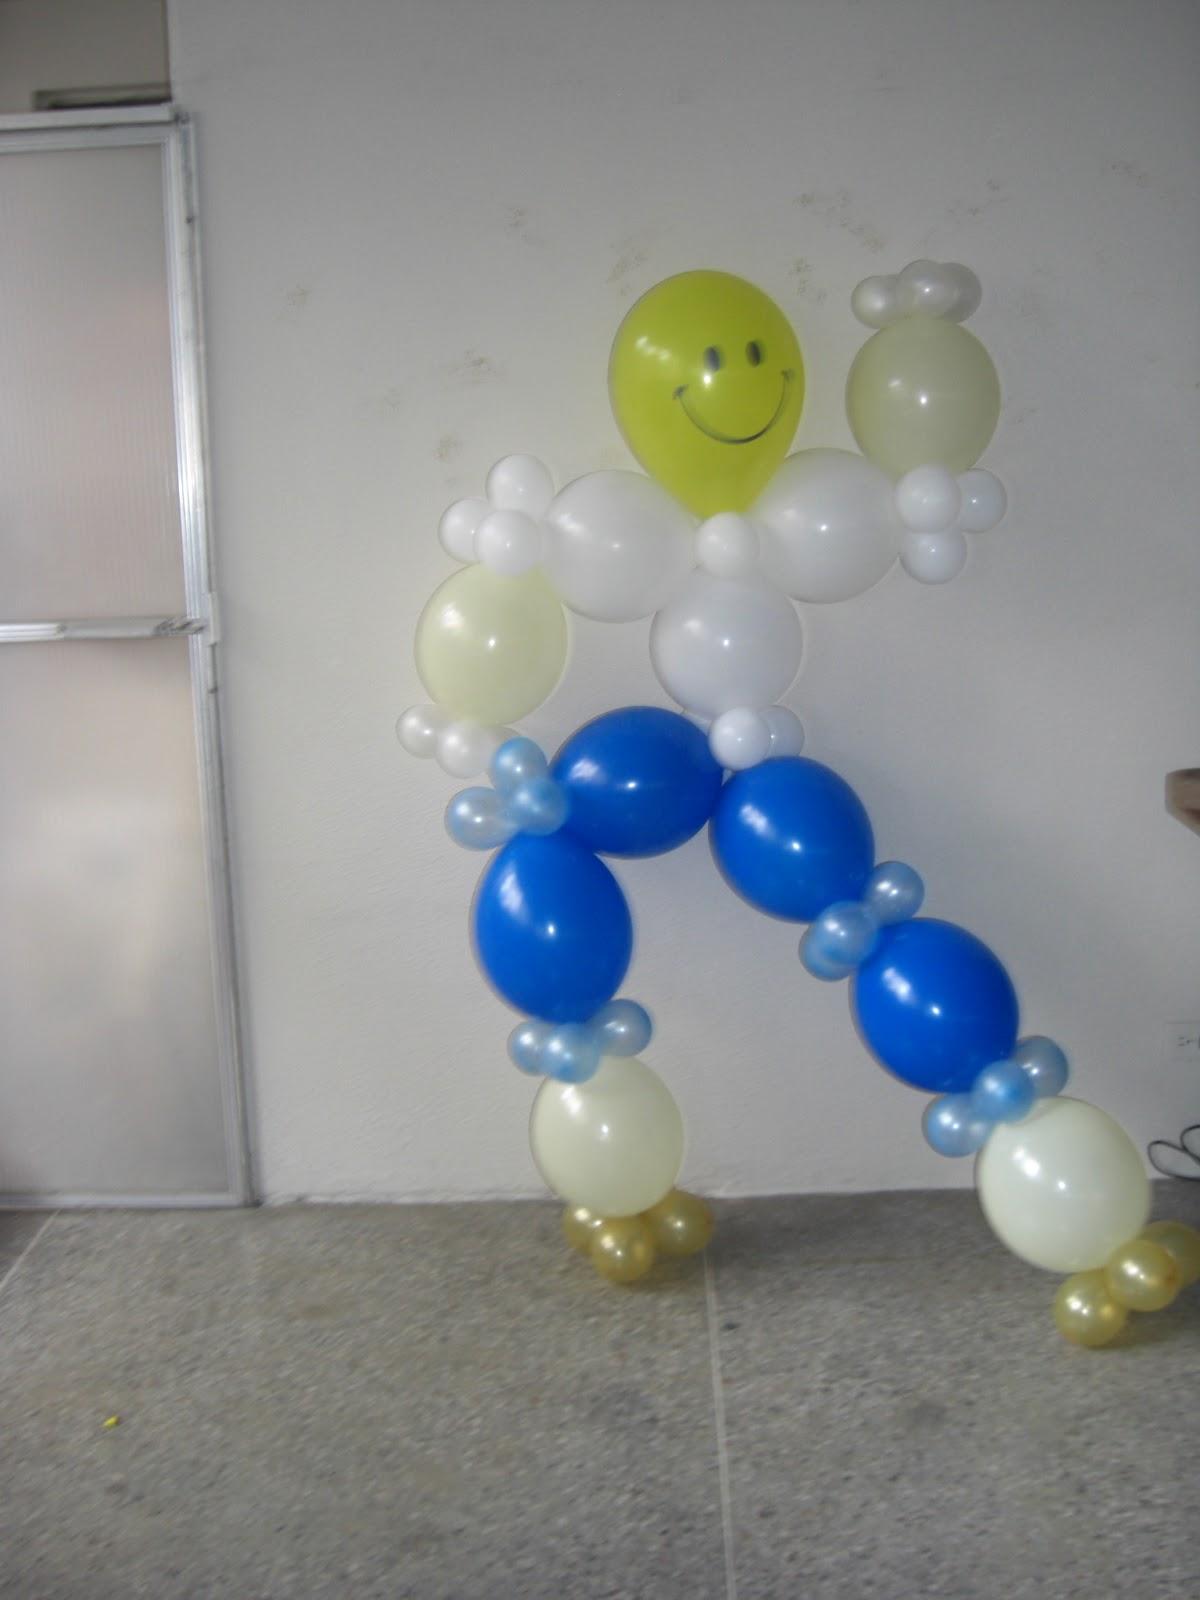 Fkp cursos de globos - Curso decoracion con globos ...